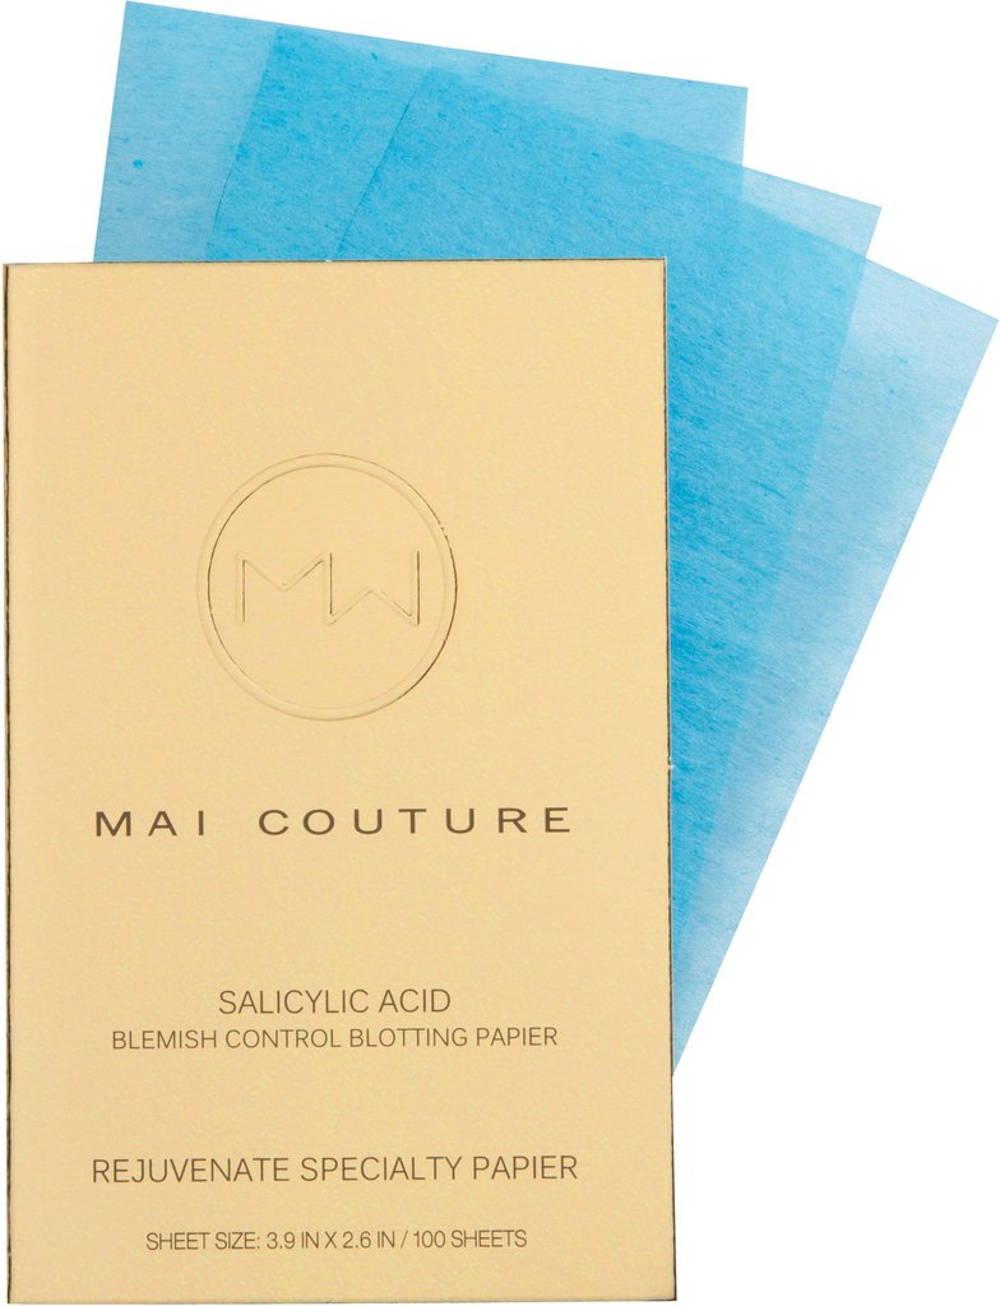 Mai couture salicylic acid paper